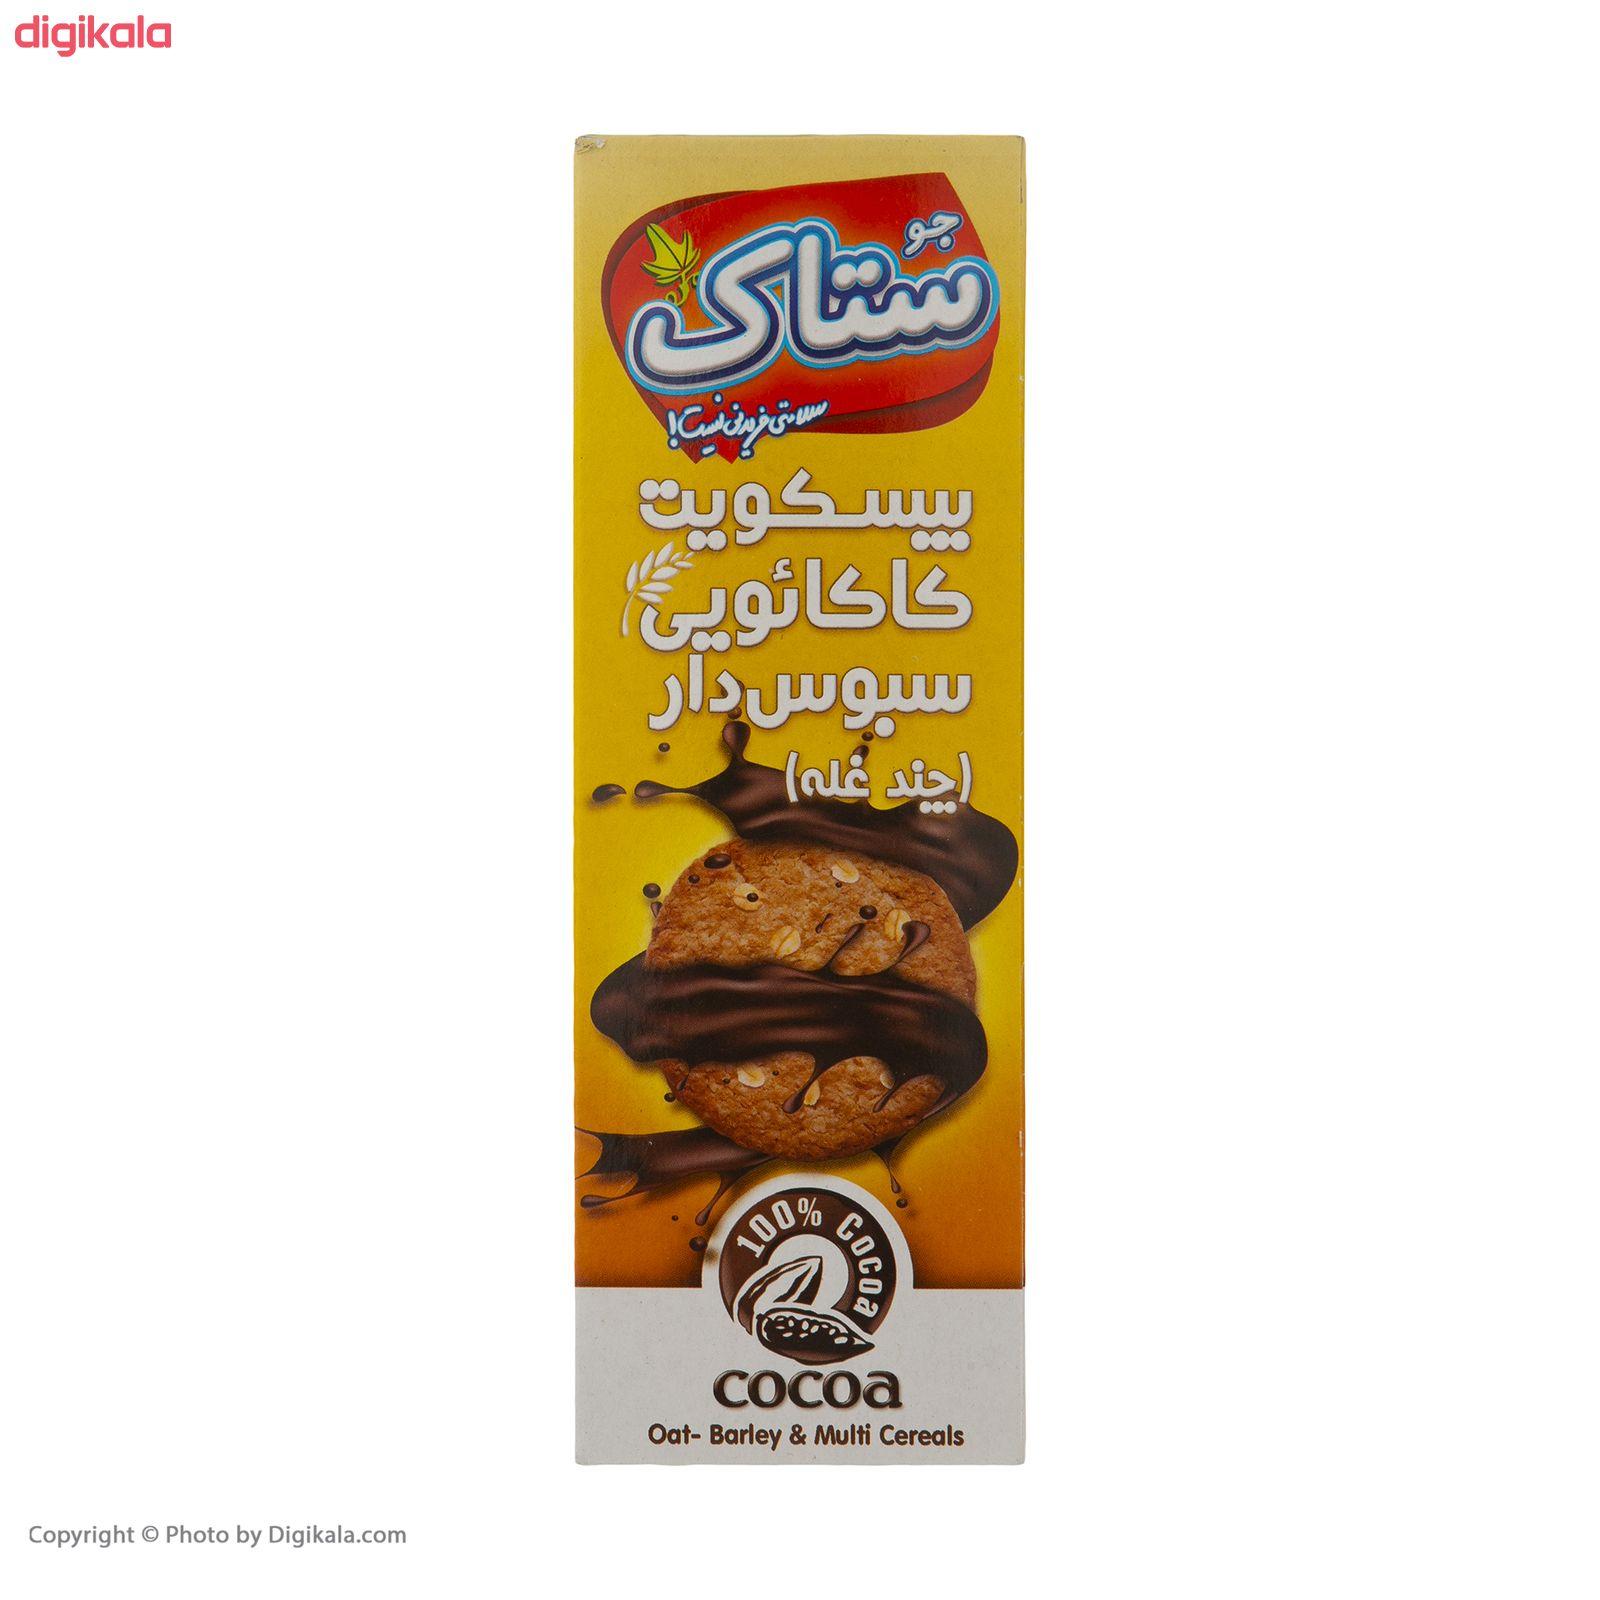 بیسکویت کاکائویی سبوس دار چند غله ستاک مقدار 350 گرم  main 1 1